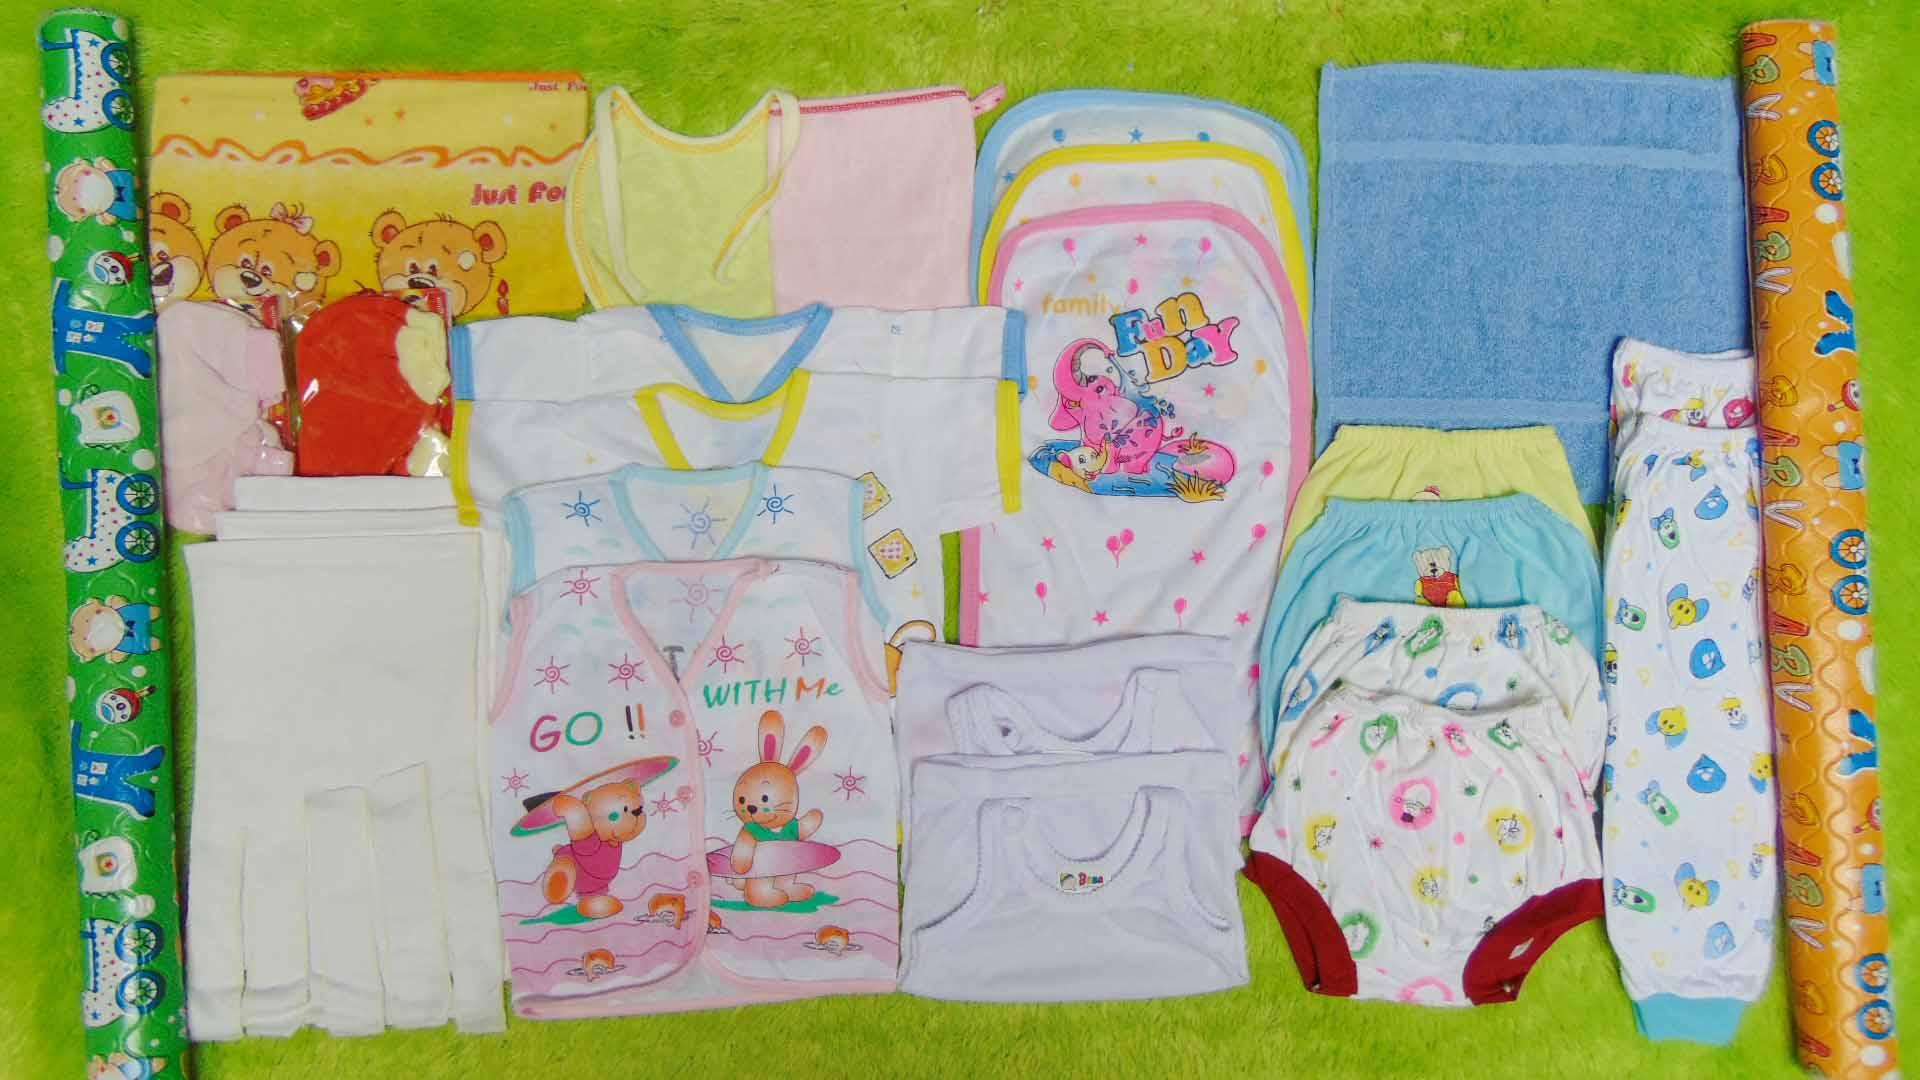 paket bayi baru lahir lengkap murah kado lahiran baby newborn-03